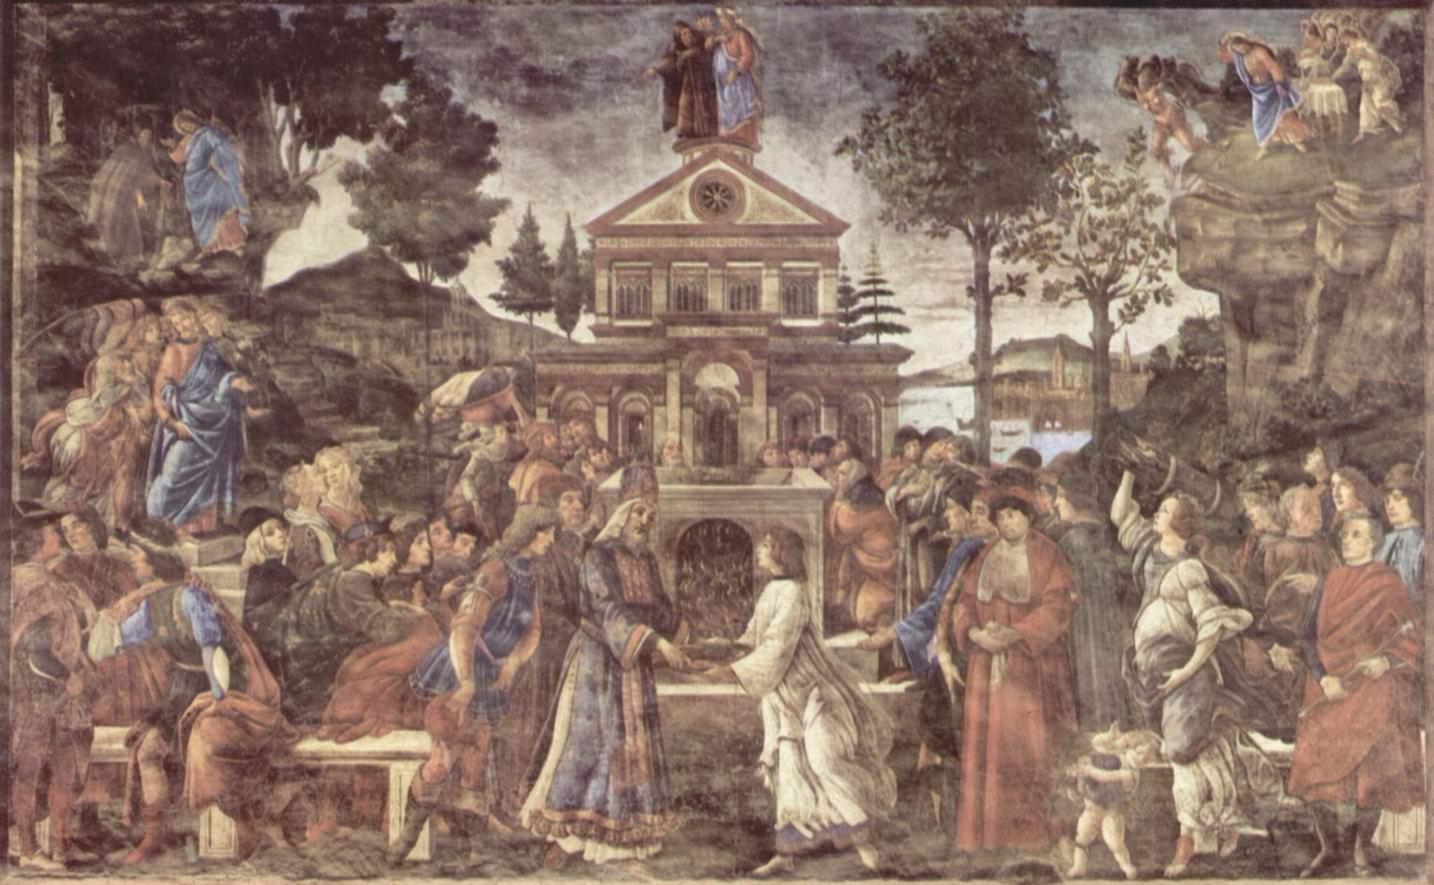 Сандро Боттичелли - Фрески Сикстинской капеллы в Риме, Искушение Христа